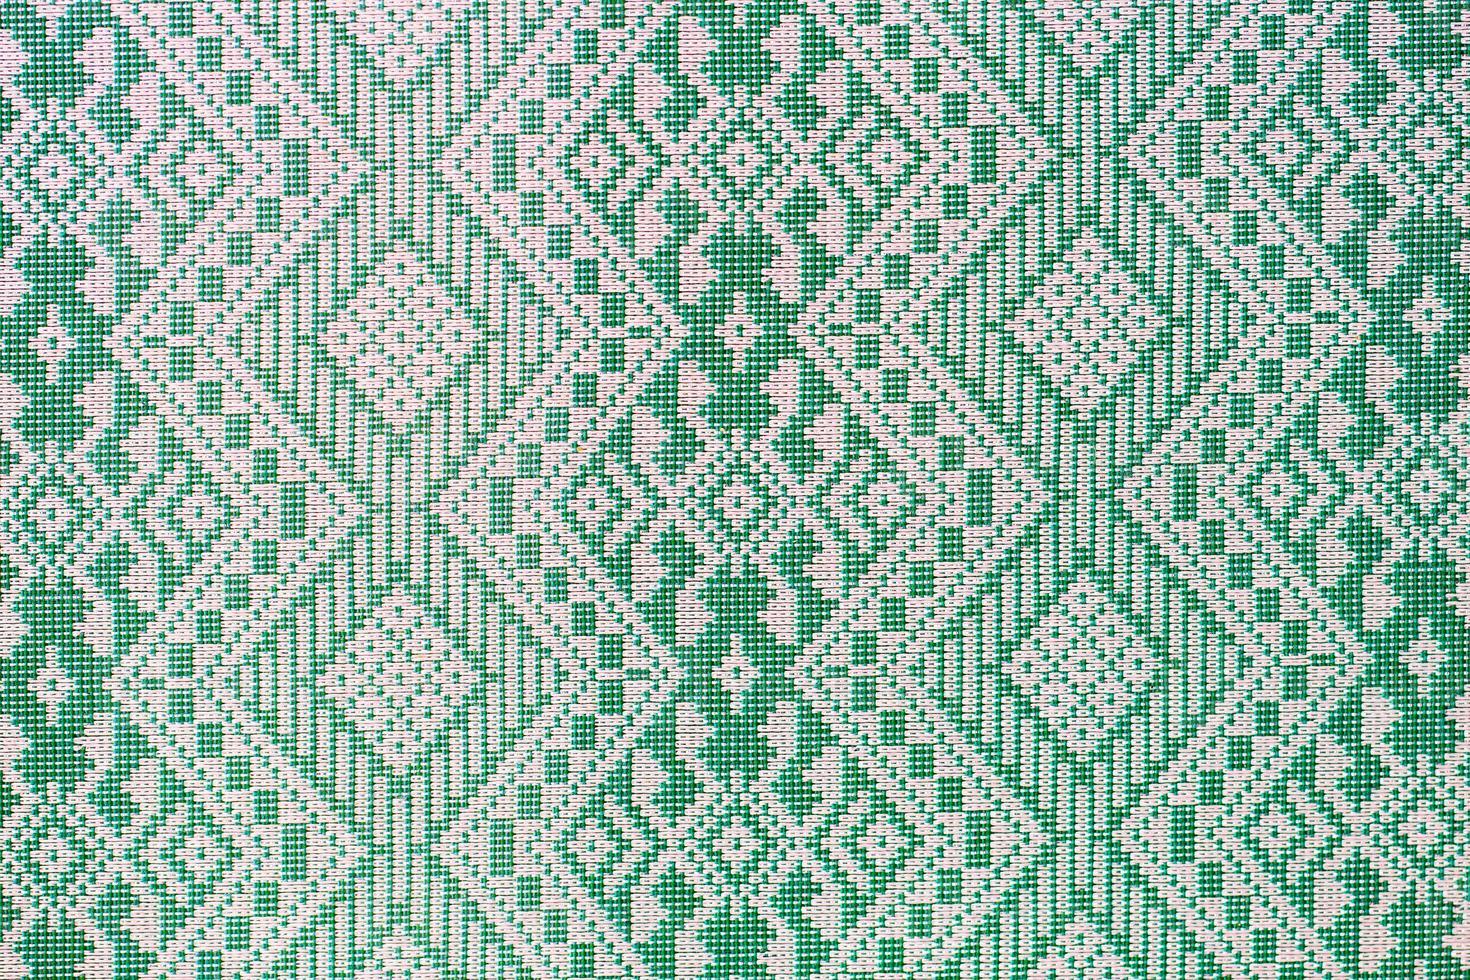 thailändskt silkegrönt mönster, Thailand textilstil foto